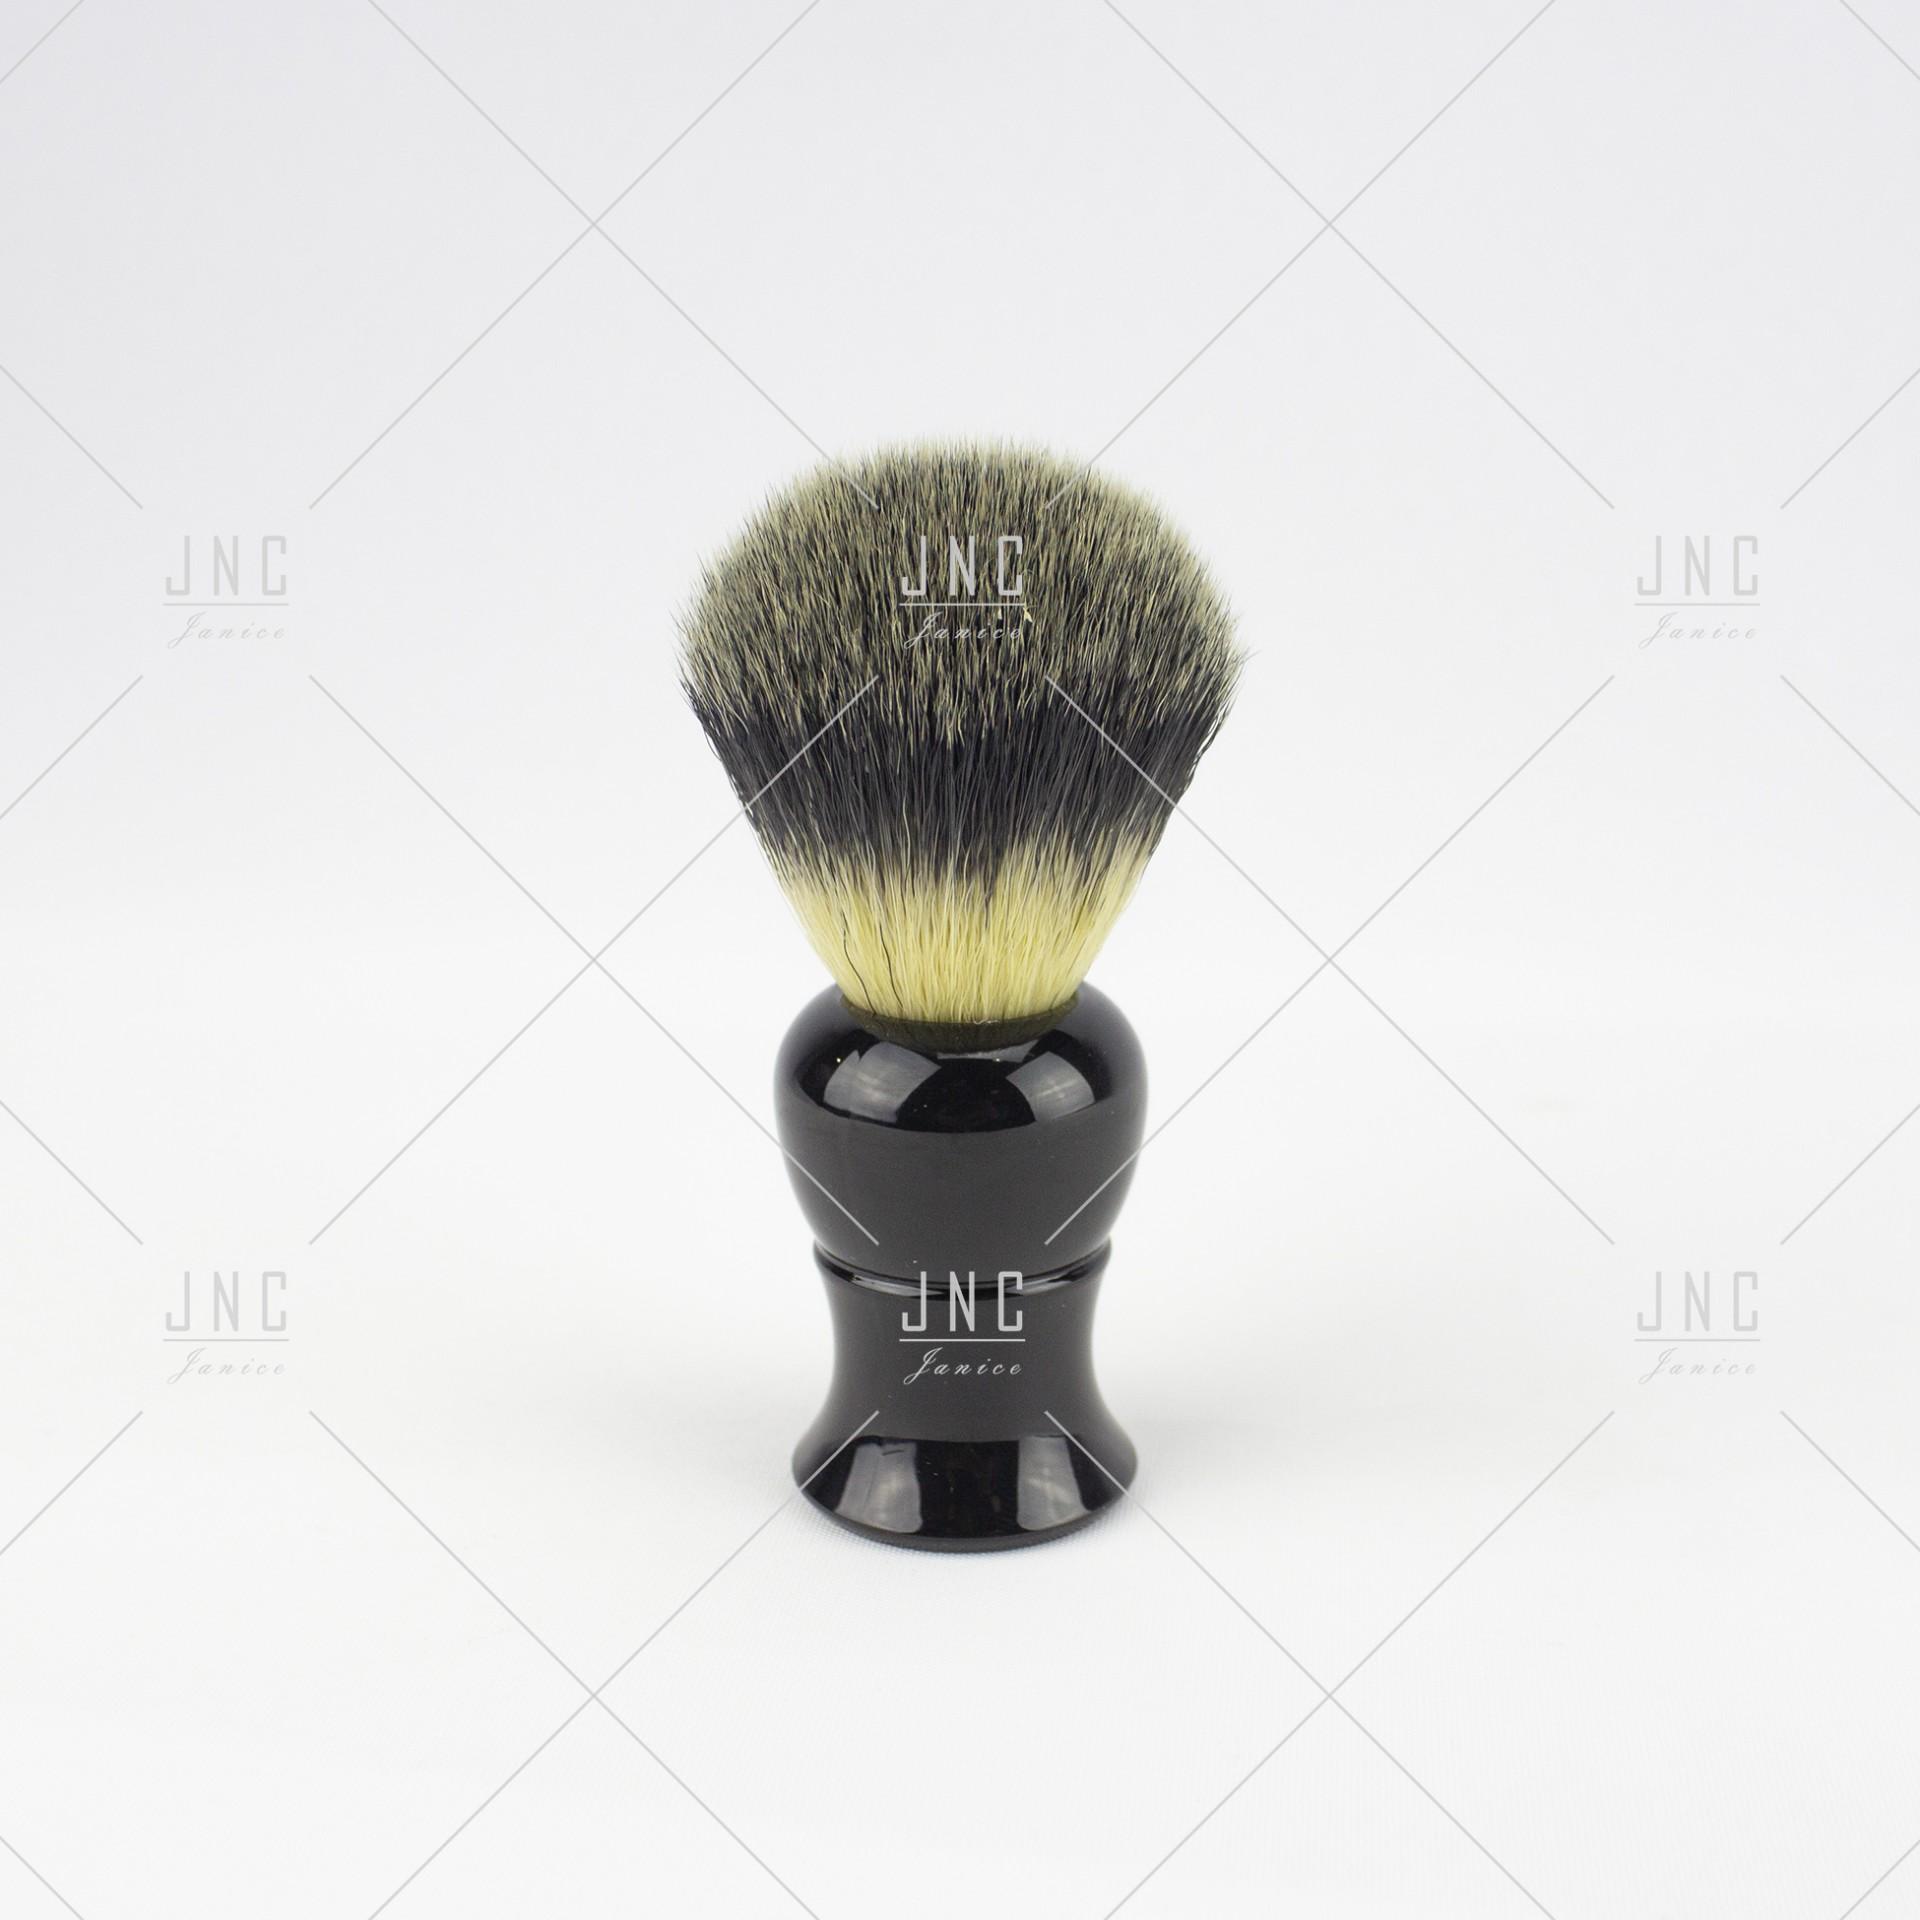 Pincel de Barbear   REF.861985